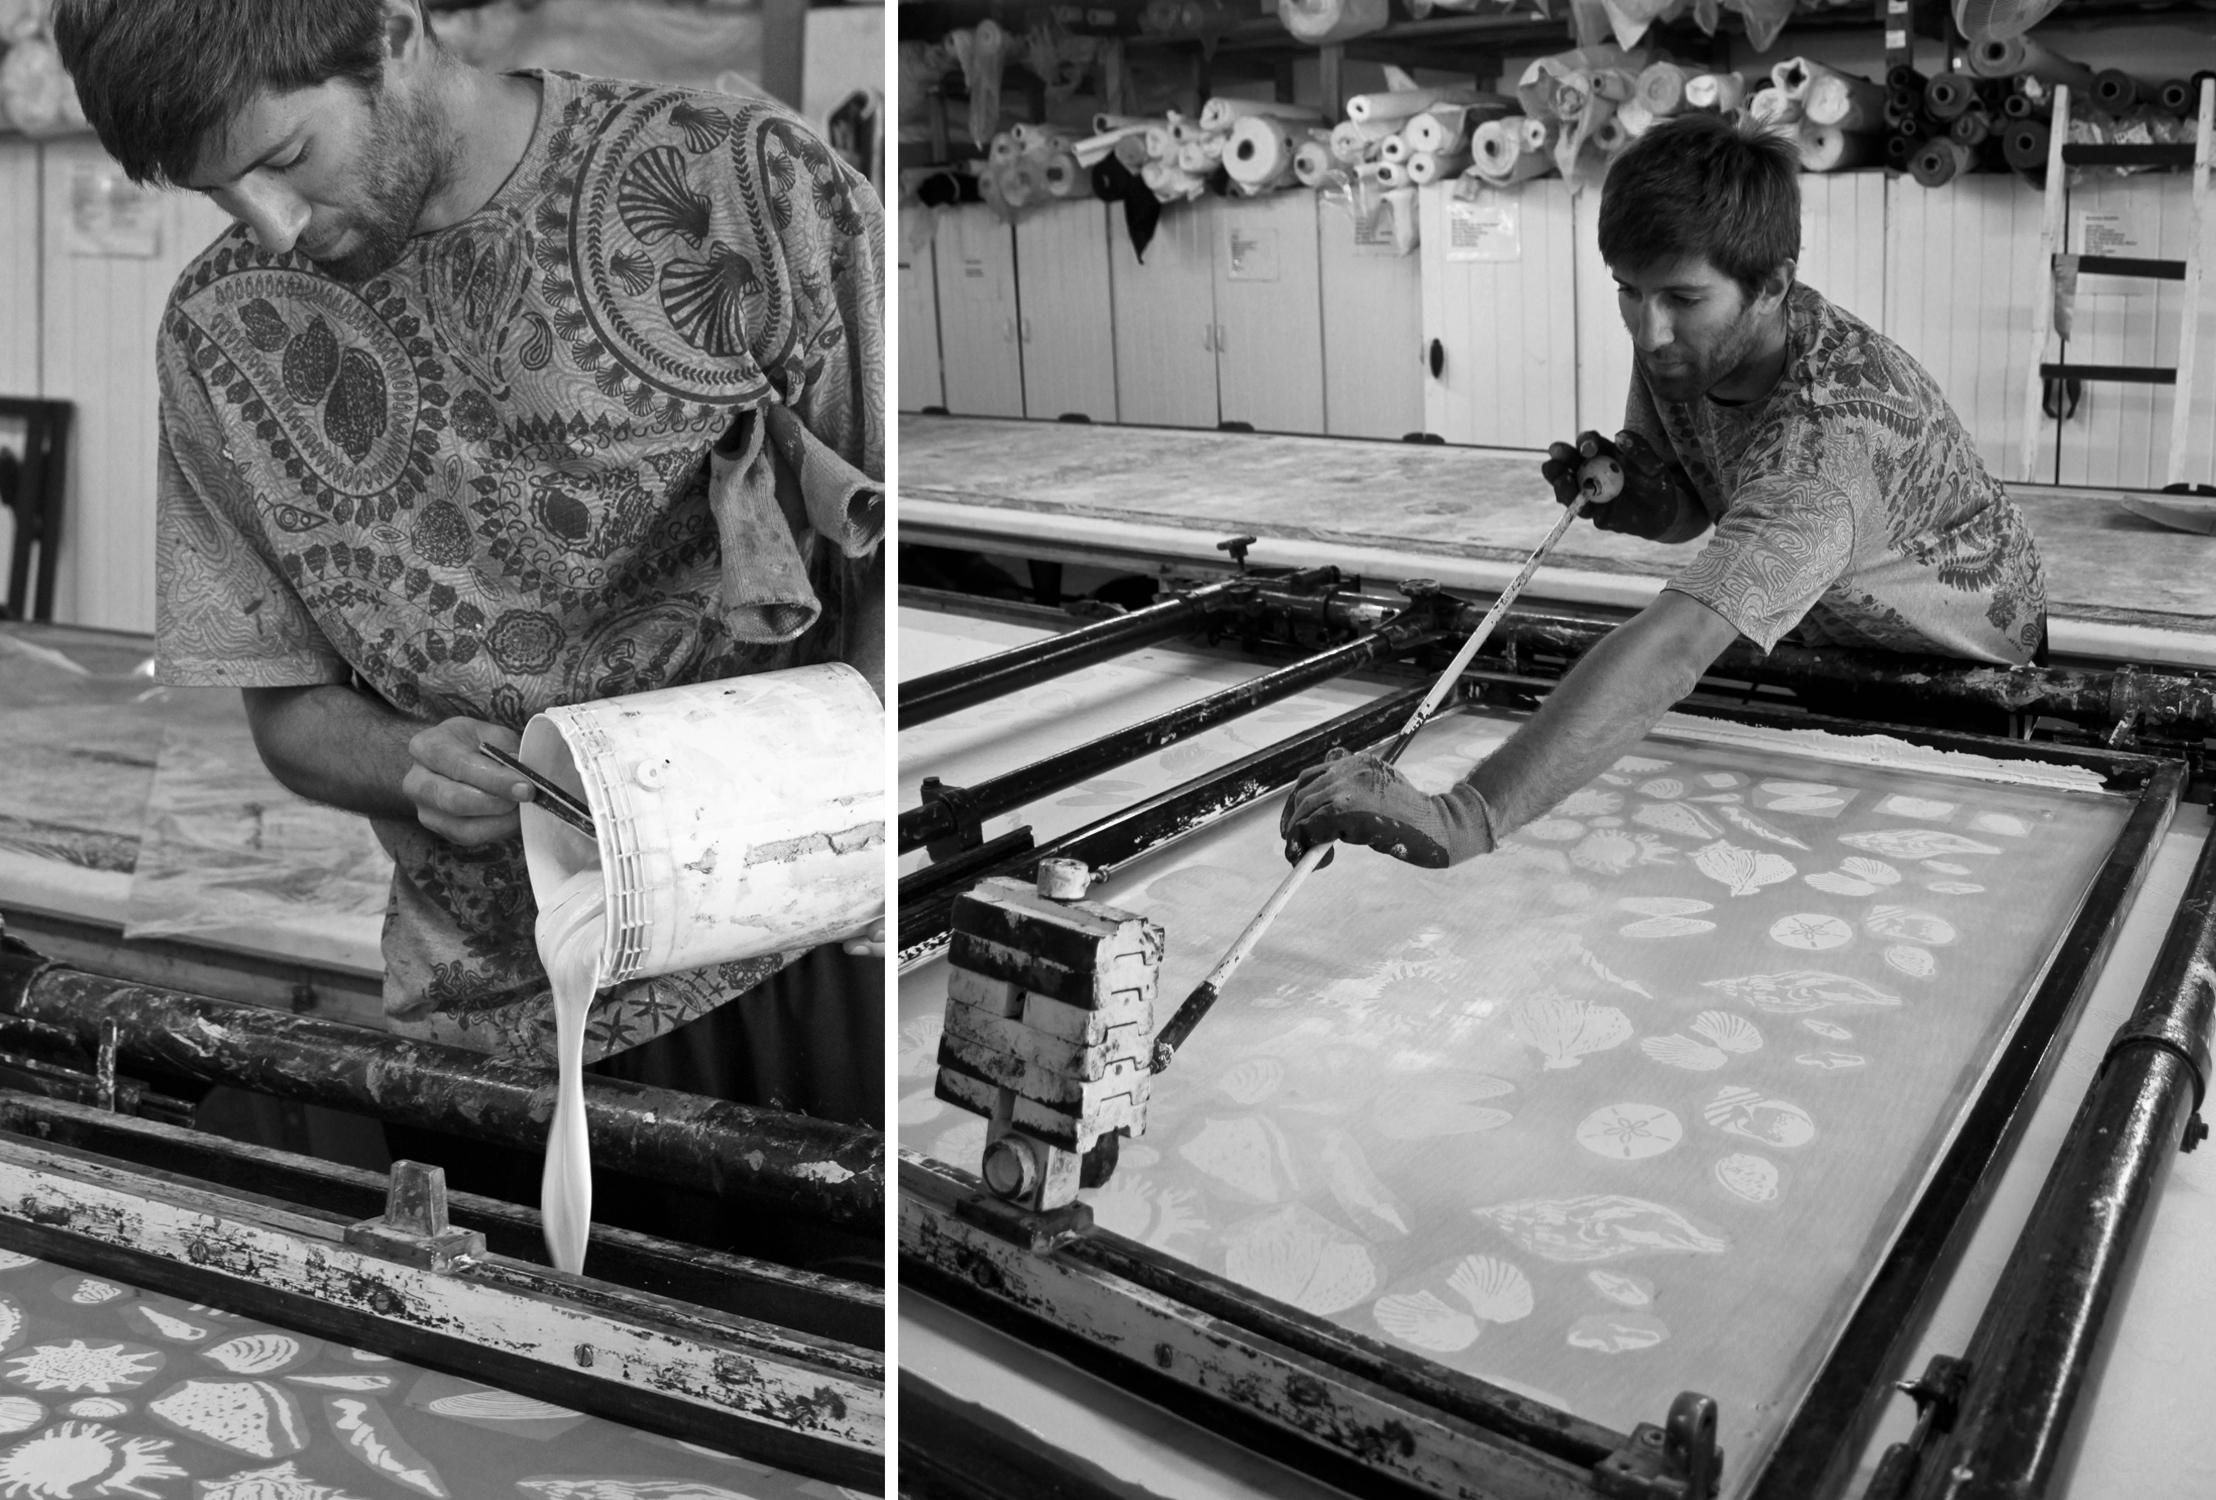 dylan-rapillard-printing-bahamahandprints-nassau-bahamas copy.jpg